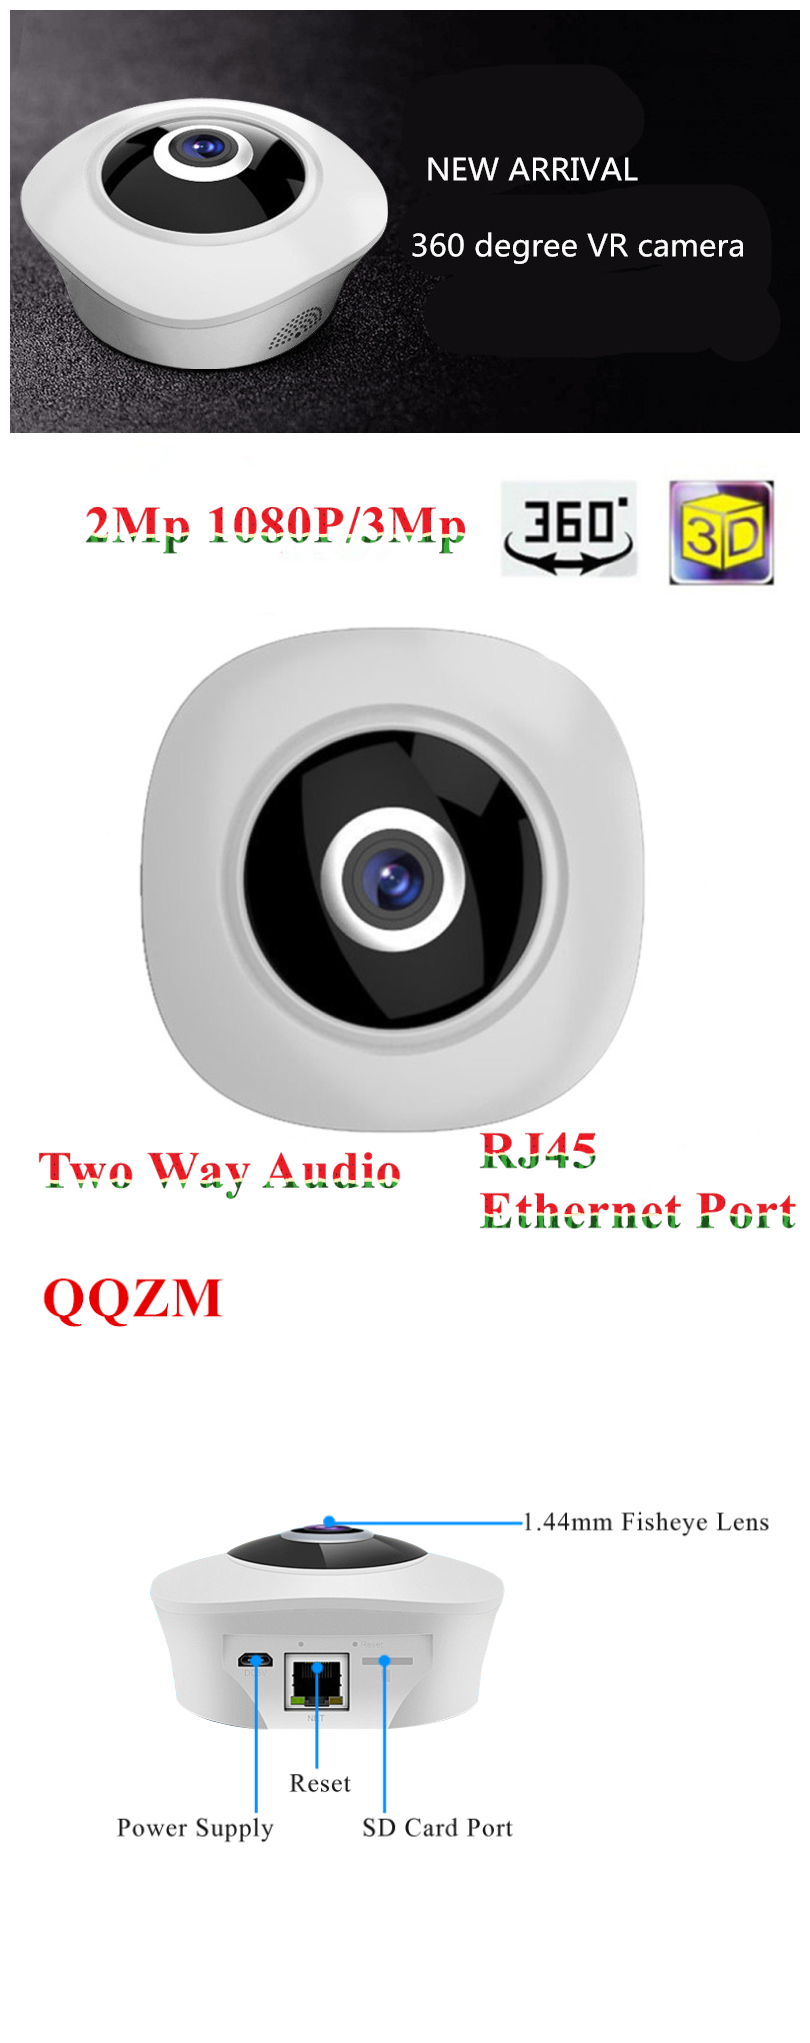 Wifi Smart Camera P2p Hidden Camera For Iphone Spy Camera Hidden Remote -  Buy Wifi Smart Camera,P2p Hidden Camera For Iphone,Spy Camera Hidden Remote